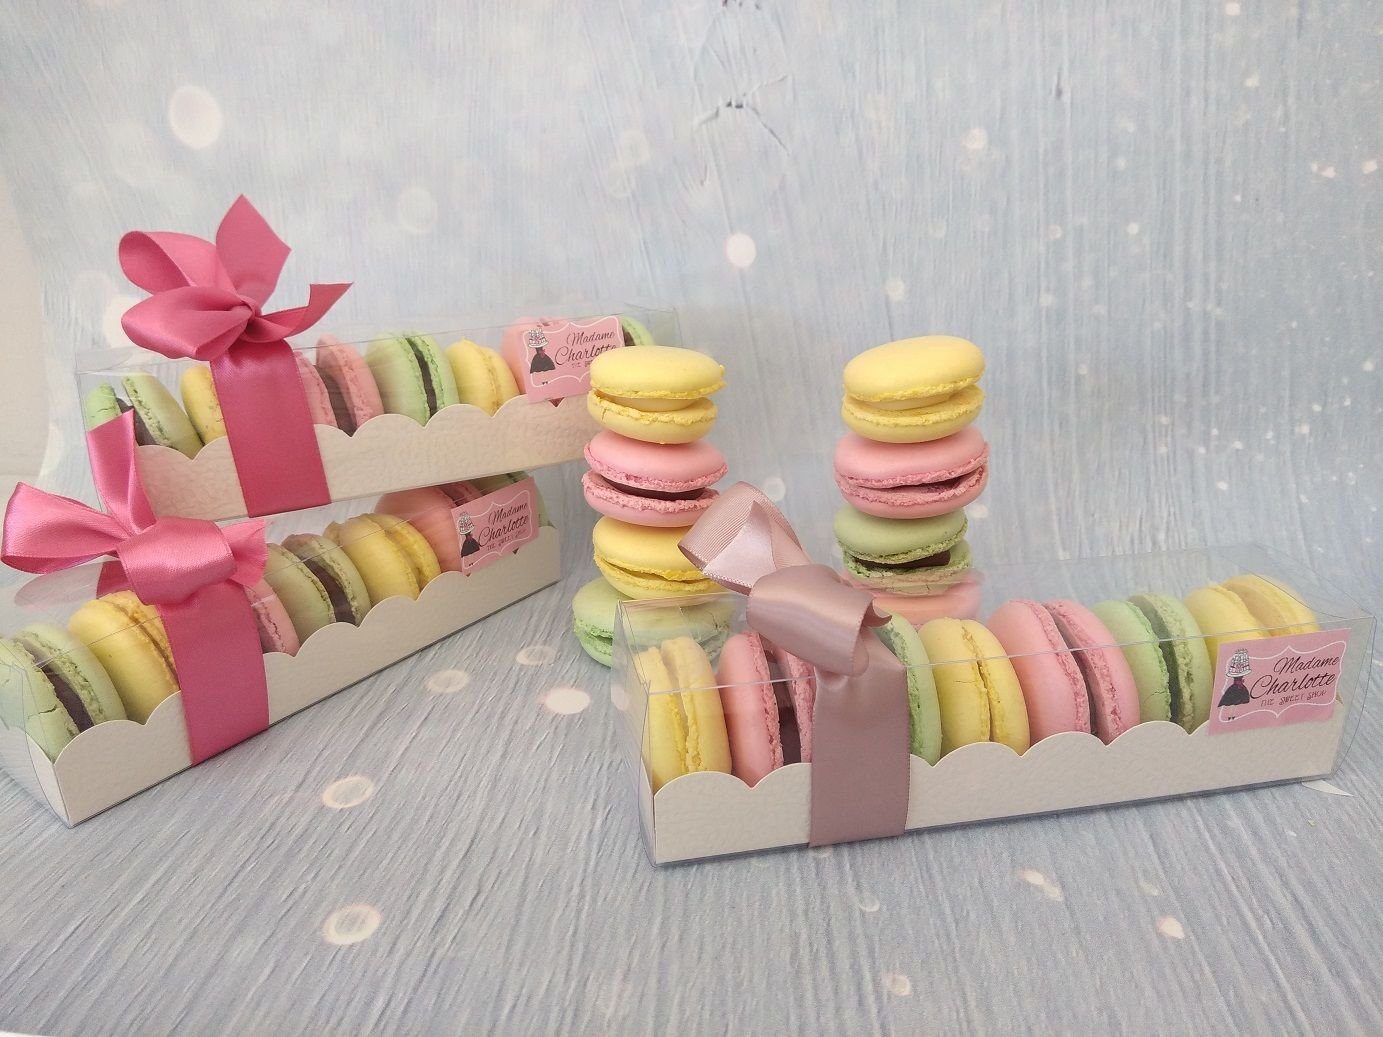 macaron, μακαρον σε διάφορα χρώματα και διαφορετικές πρωτότυπες γεύσεις, Ζαχαροπλαστείο καλαμάτα madame charlotte, confectionery, patisserie, kalamata